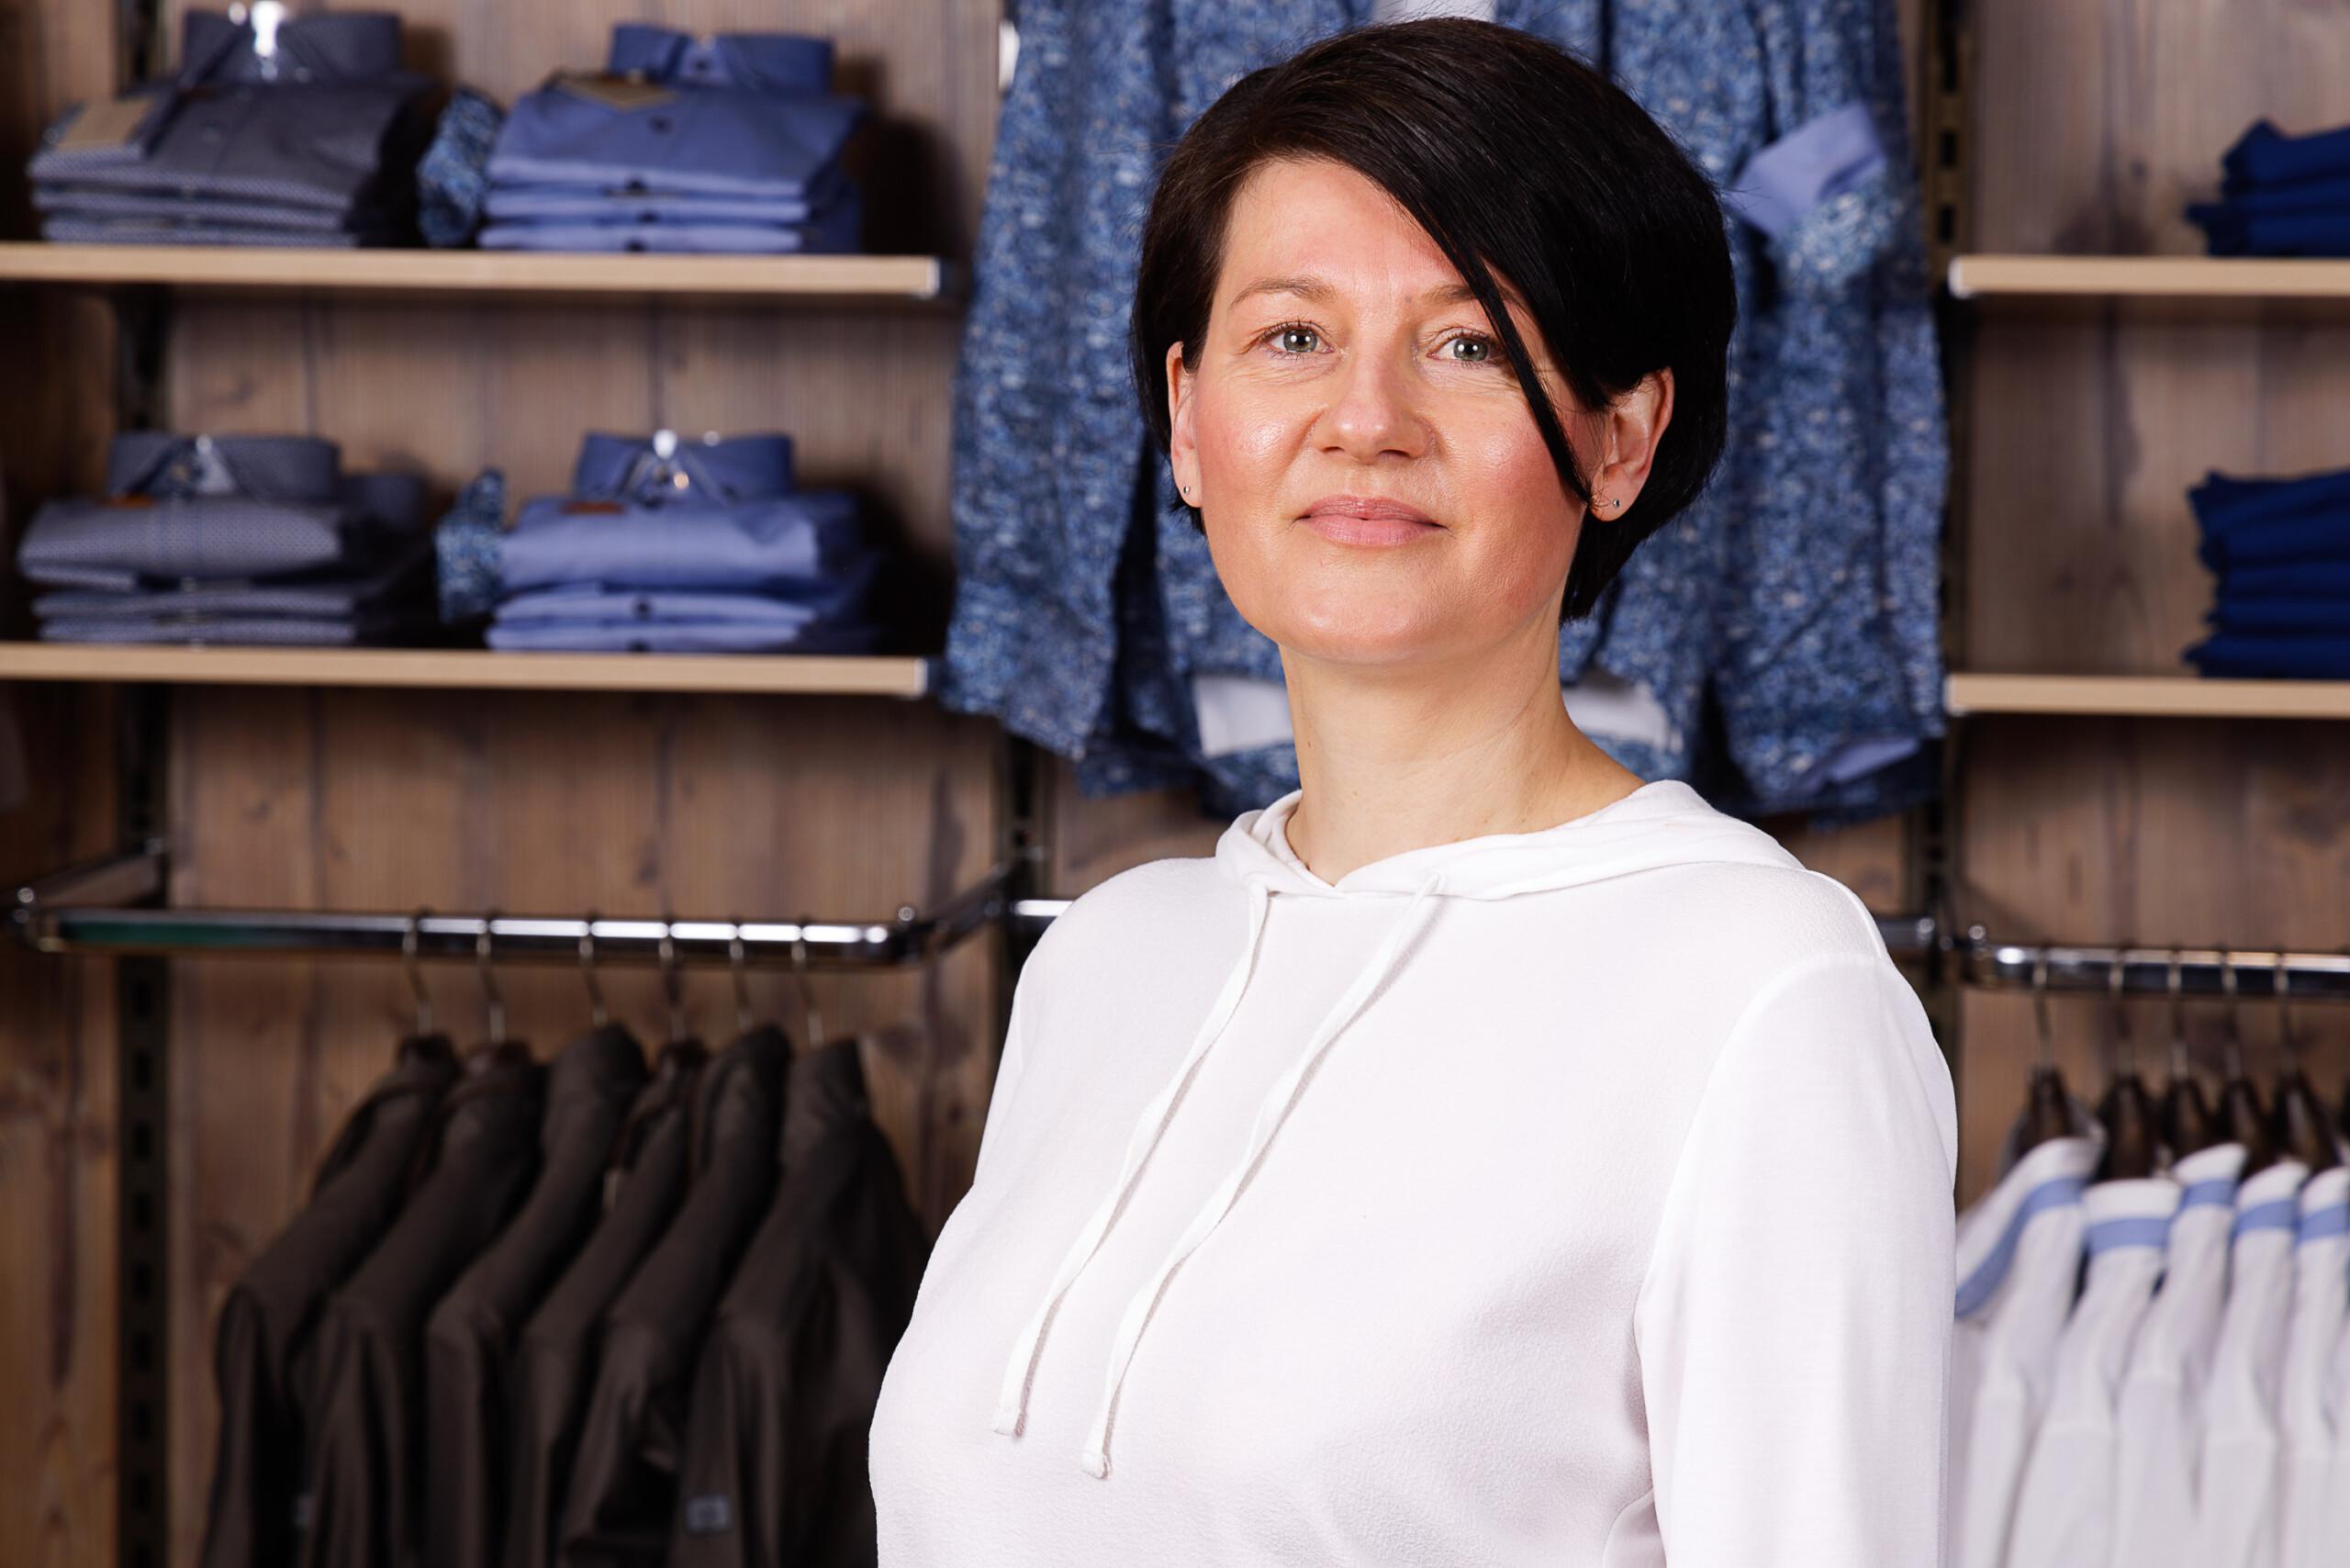 Andrea Pleyer / Modeberaterin Modern Casual